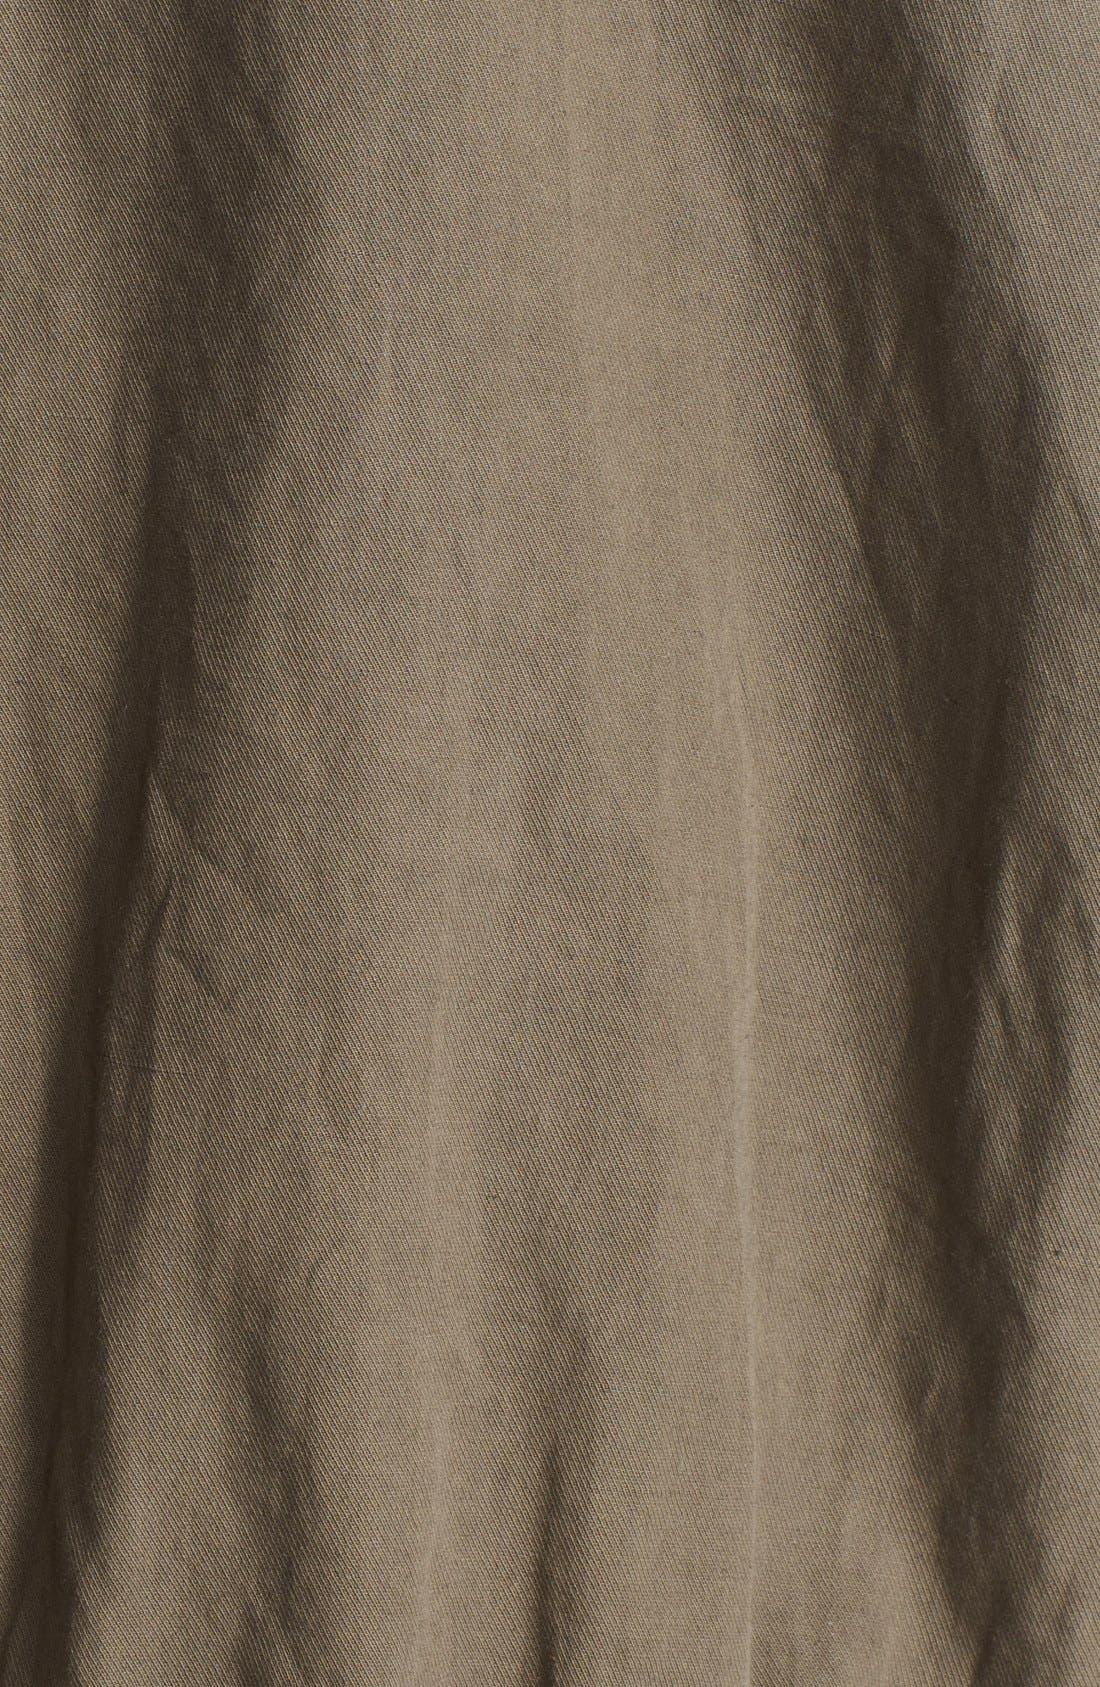 Alternate Image 4  - Smythe Oversized Anorak with Faux Fur Hood